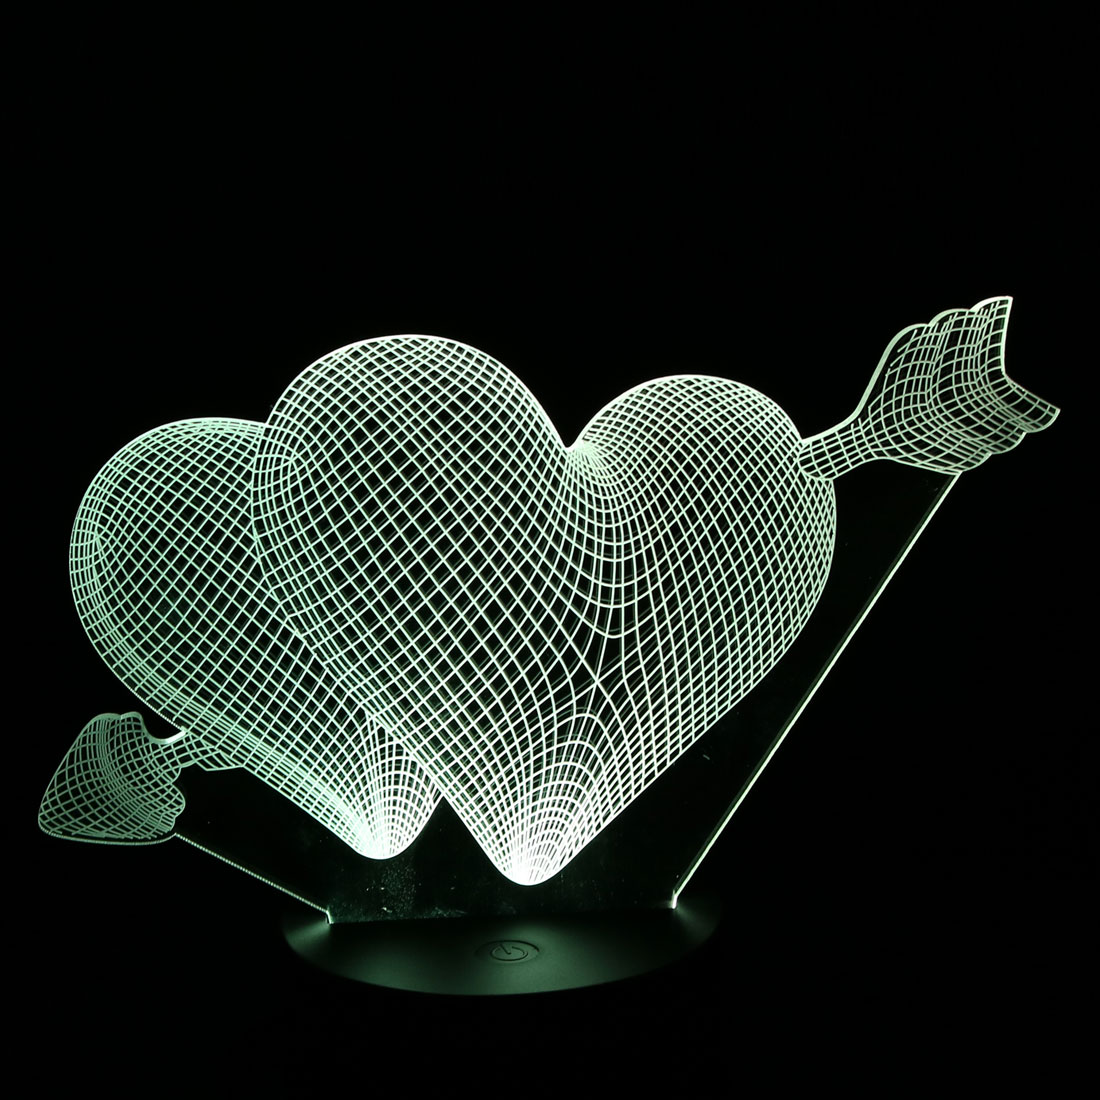 DC 5V Cupid Arrow 3D Acrylic LED Night Light 7 Color Change Desk Table Lamp - image 6 of 7